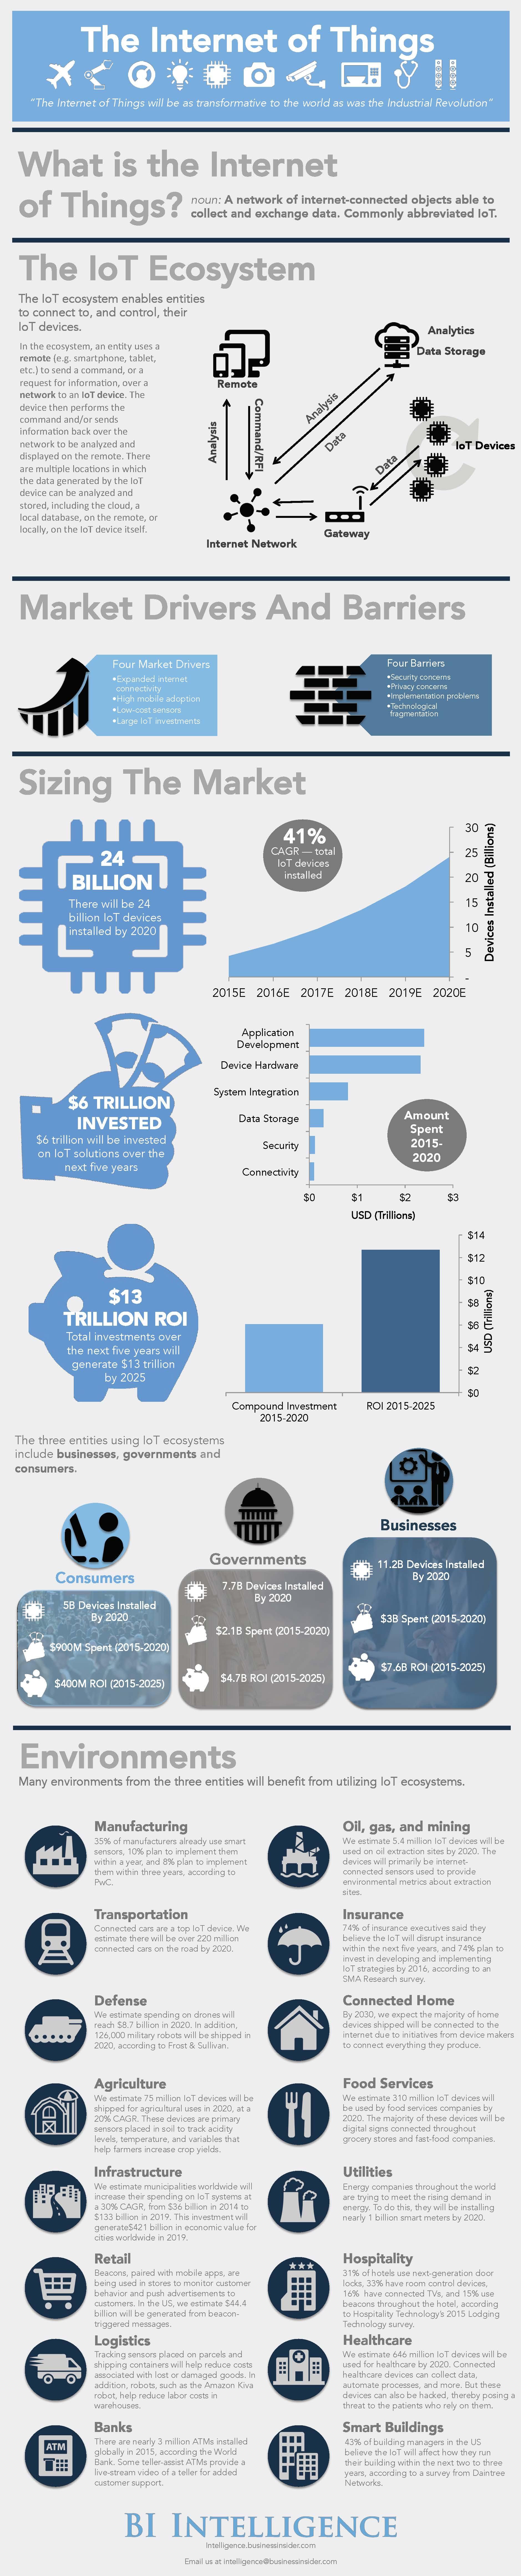 IoT Infographic - Evans on Marketing